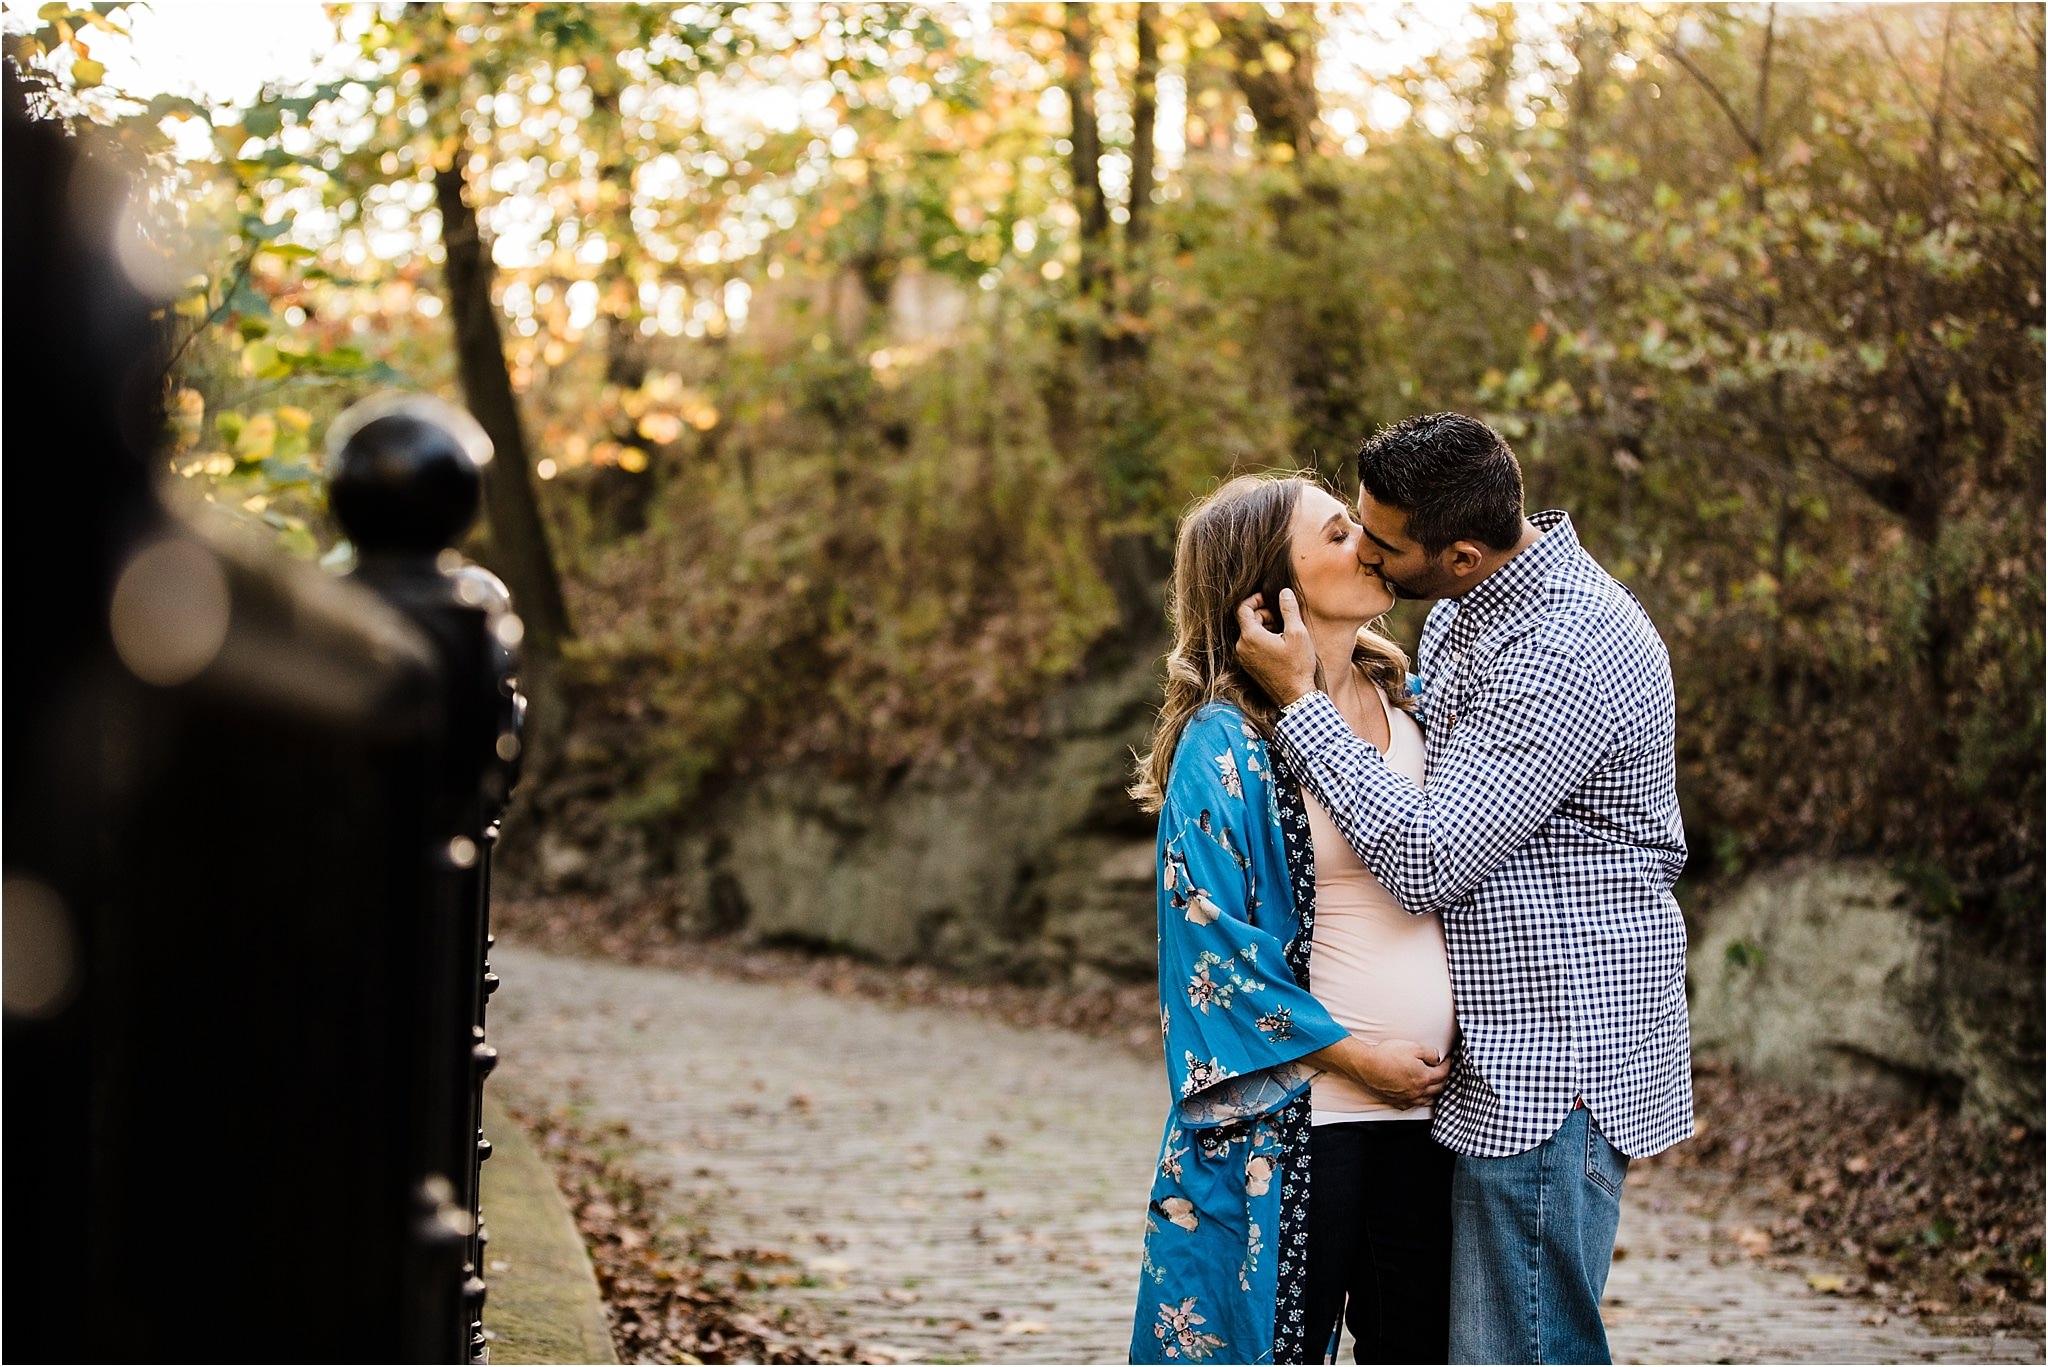 Husband kissing wife maternity photo